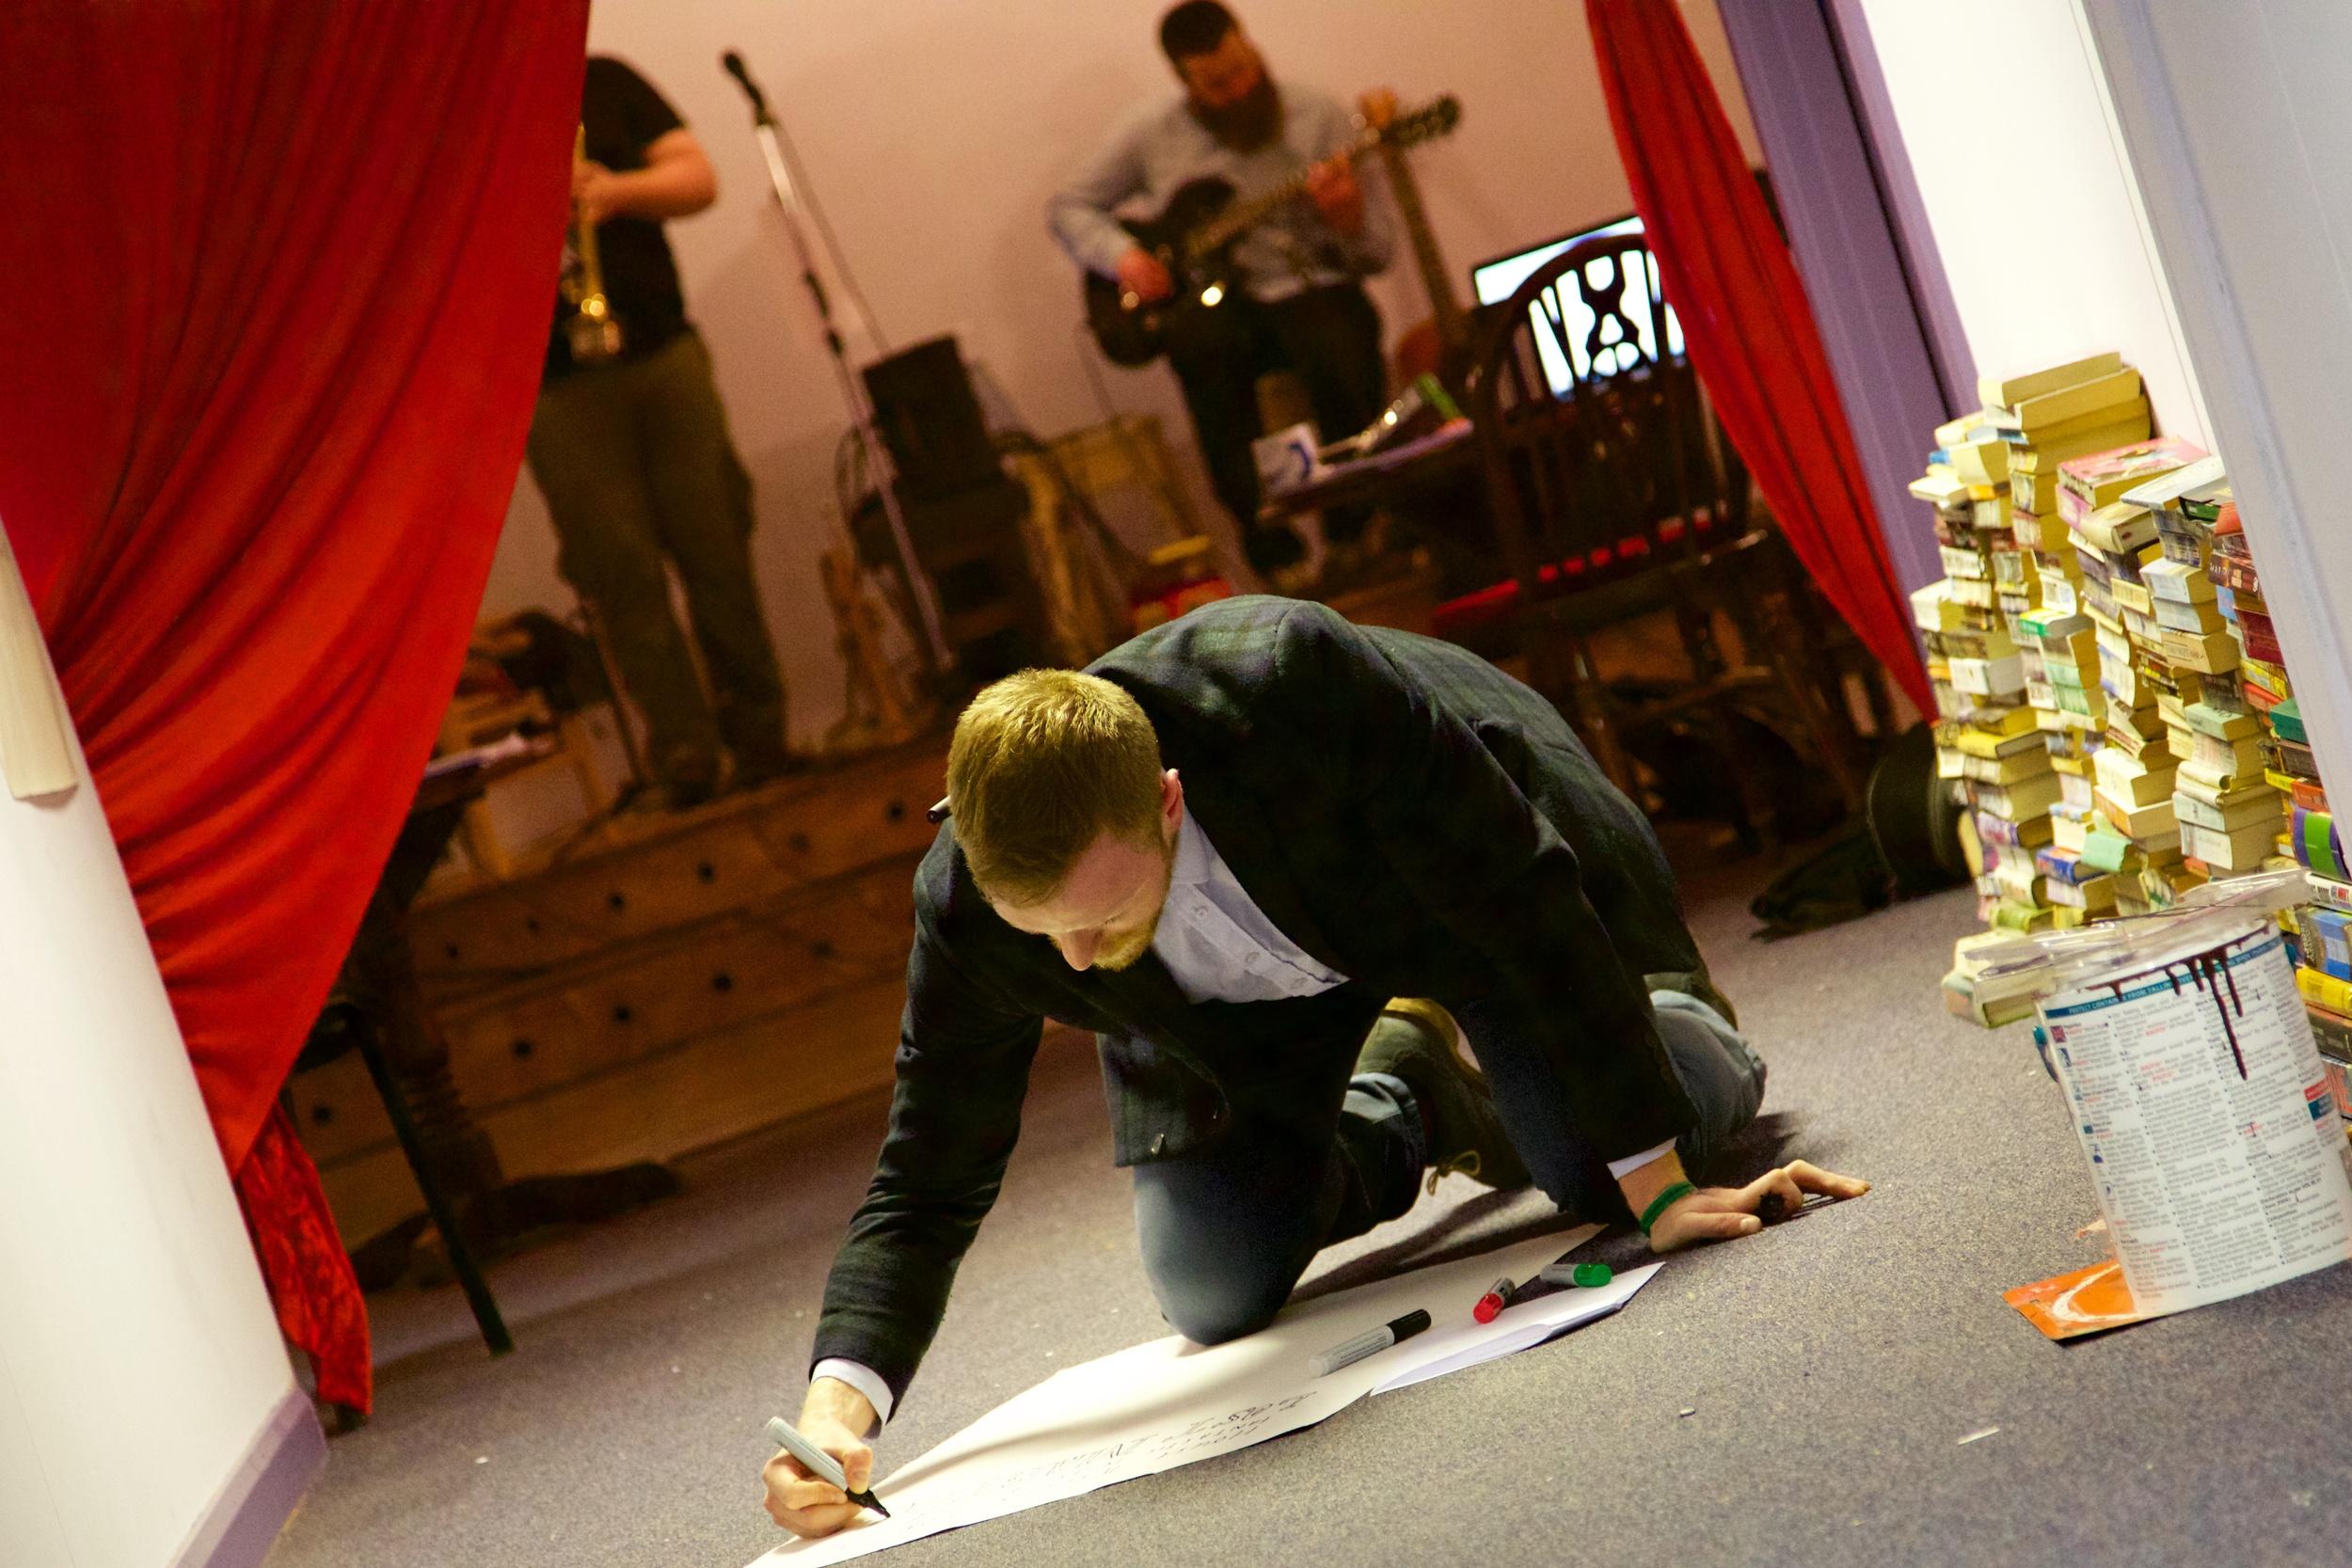 Artist Brian John Spencer workingon signage amidst rehearsals